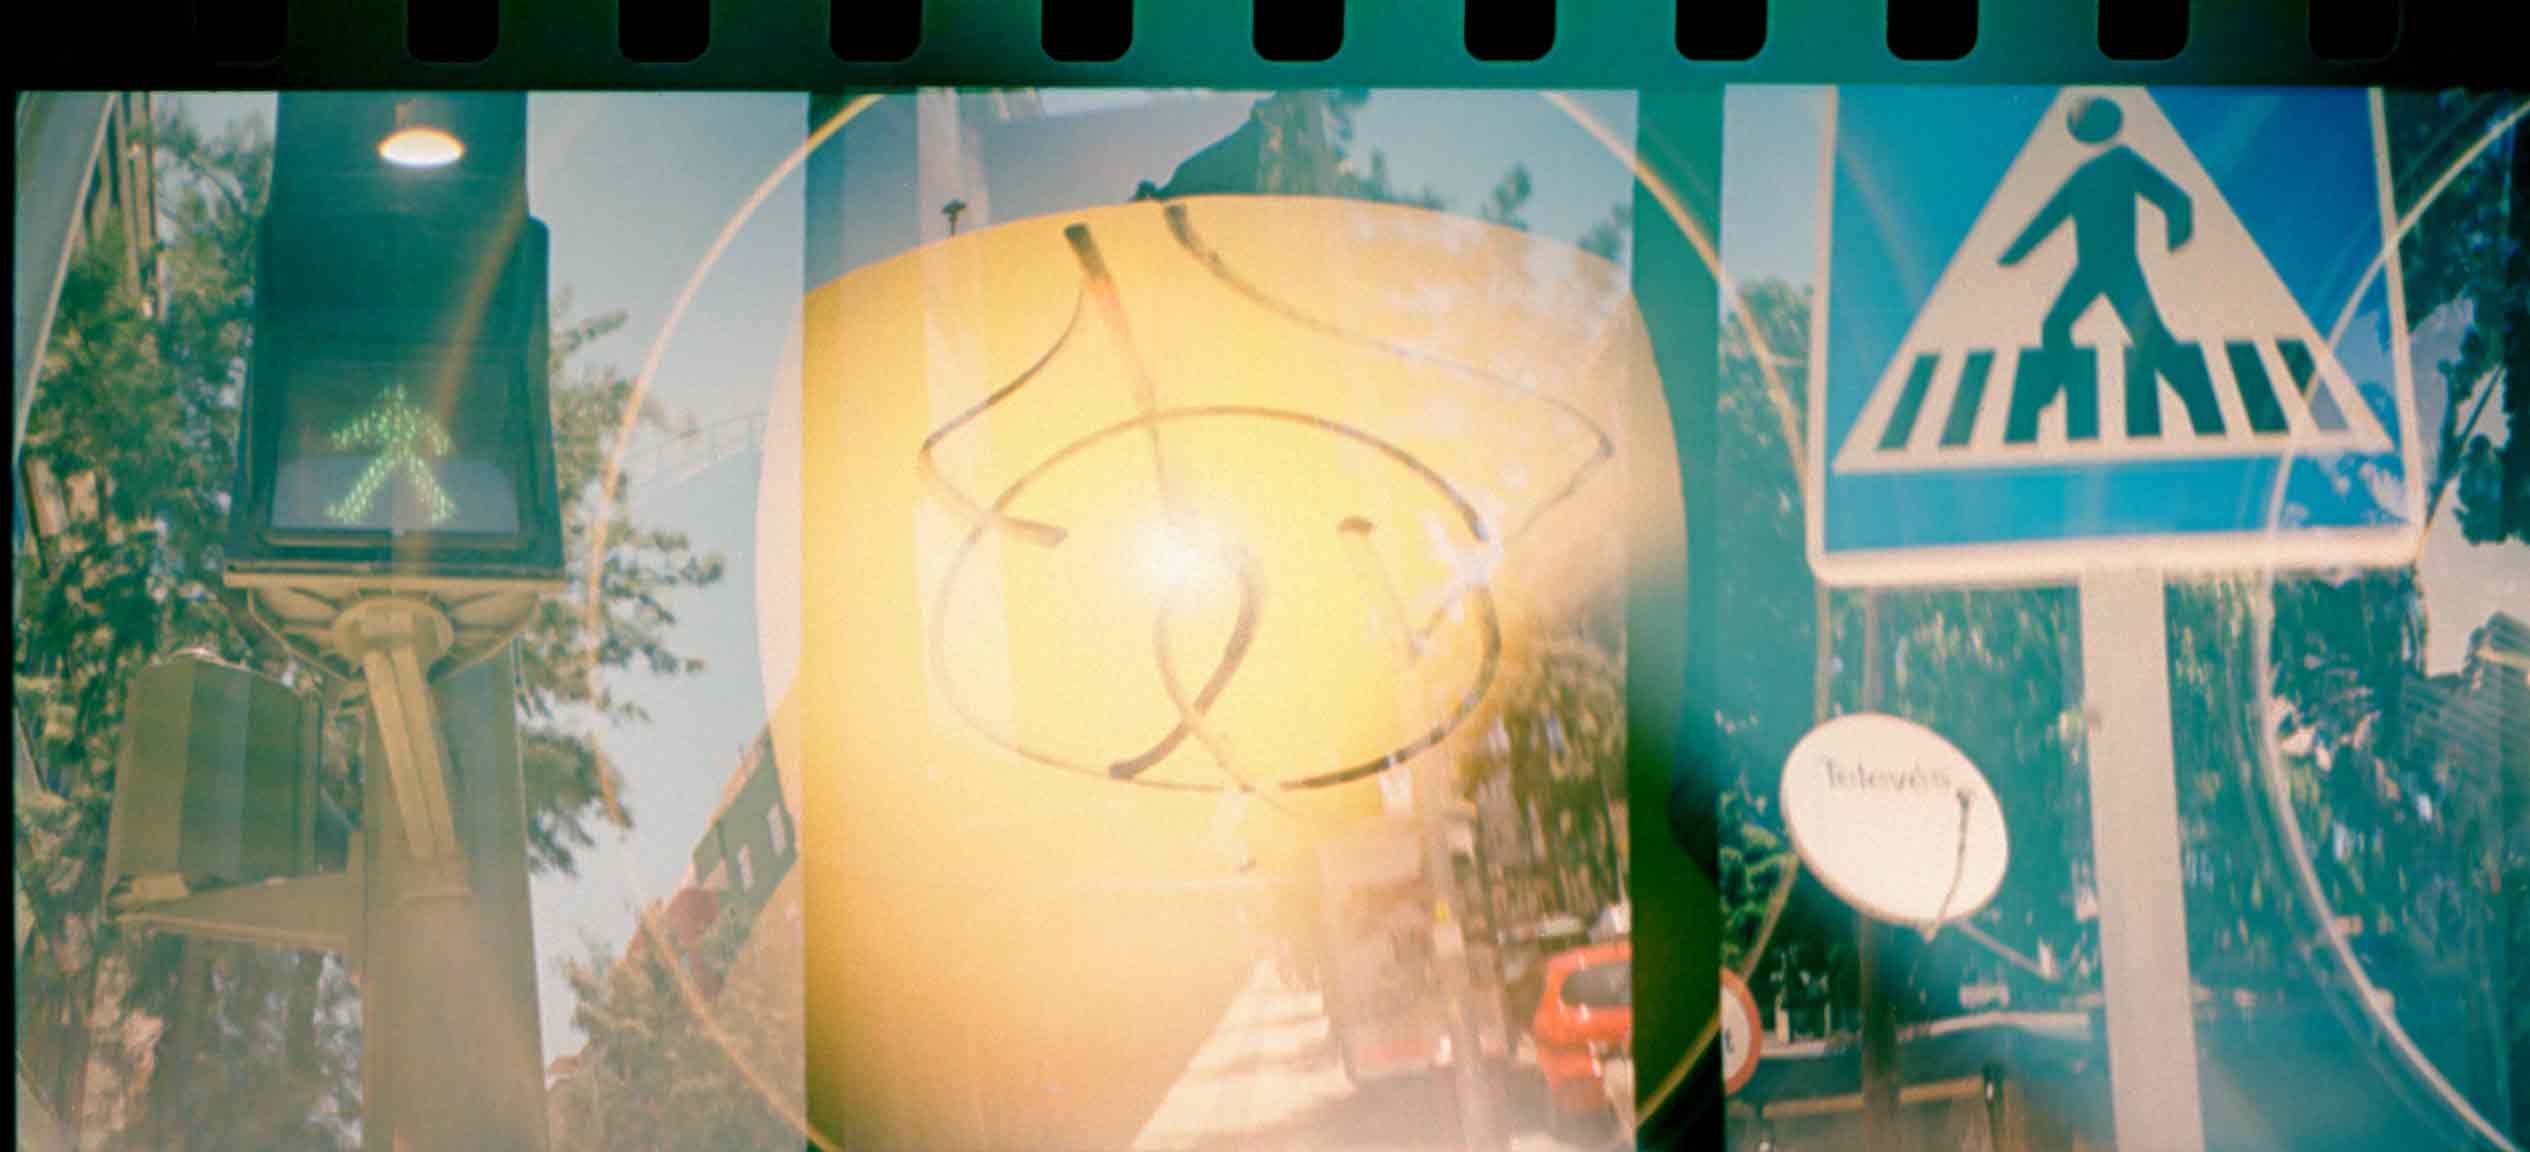 FilmSwap-fotografia-oldskull-09